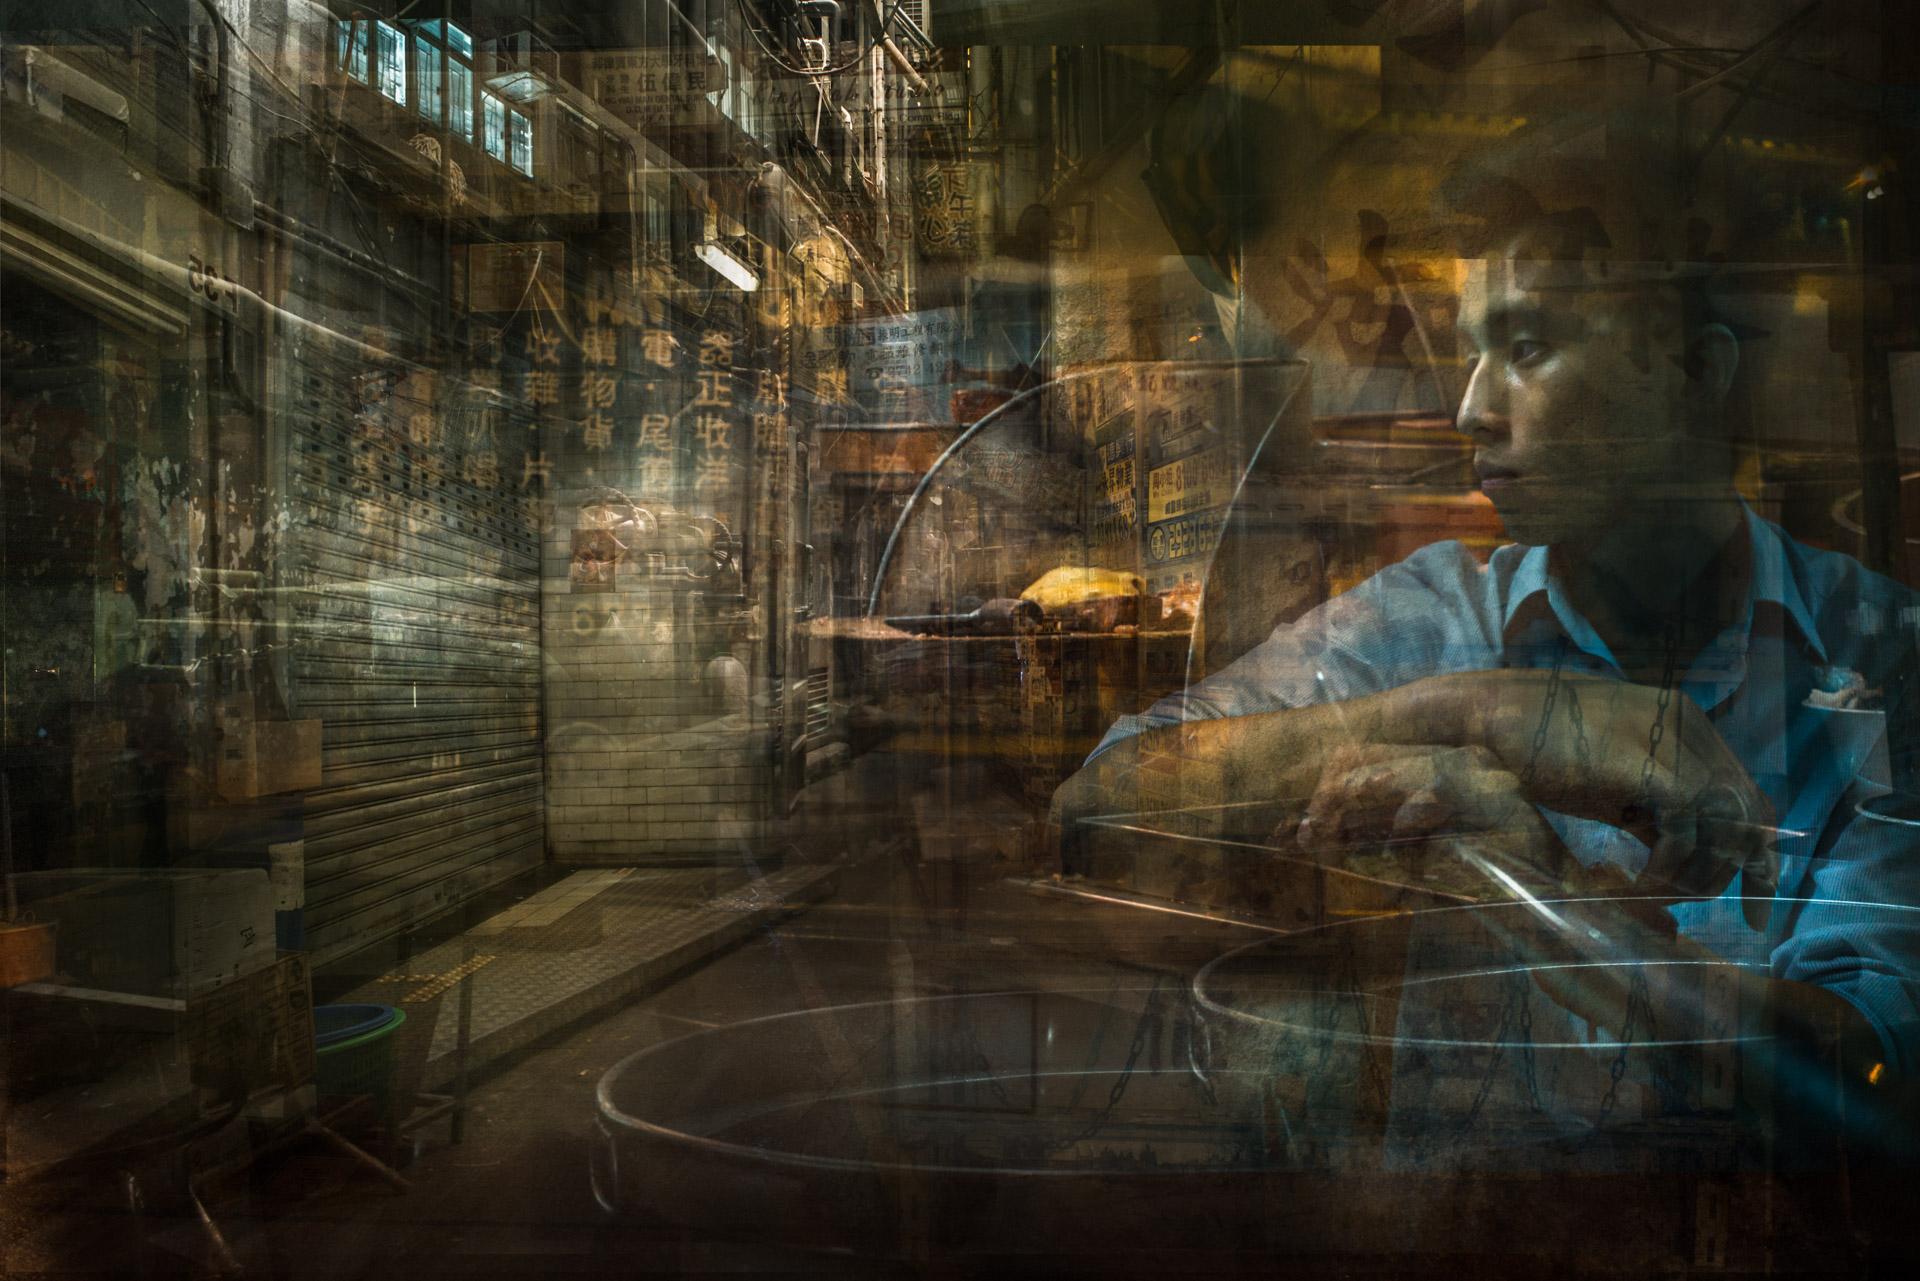 Pei Ho - HK series - W-Riccardo Magherini.jpg